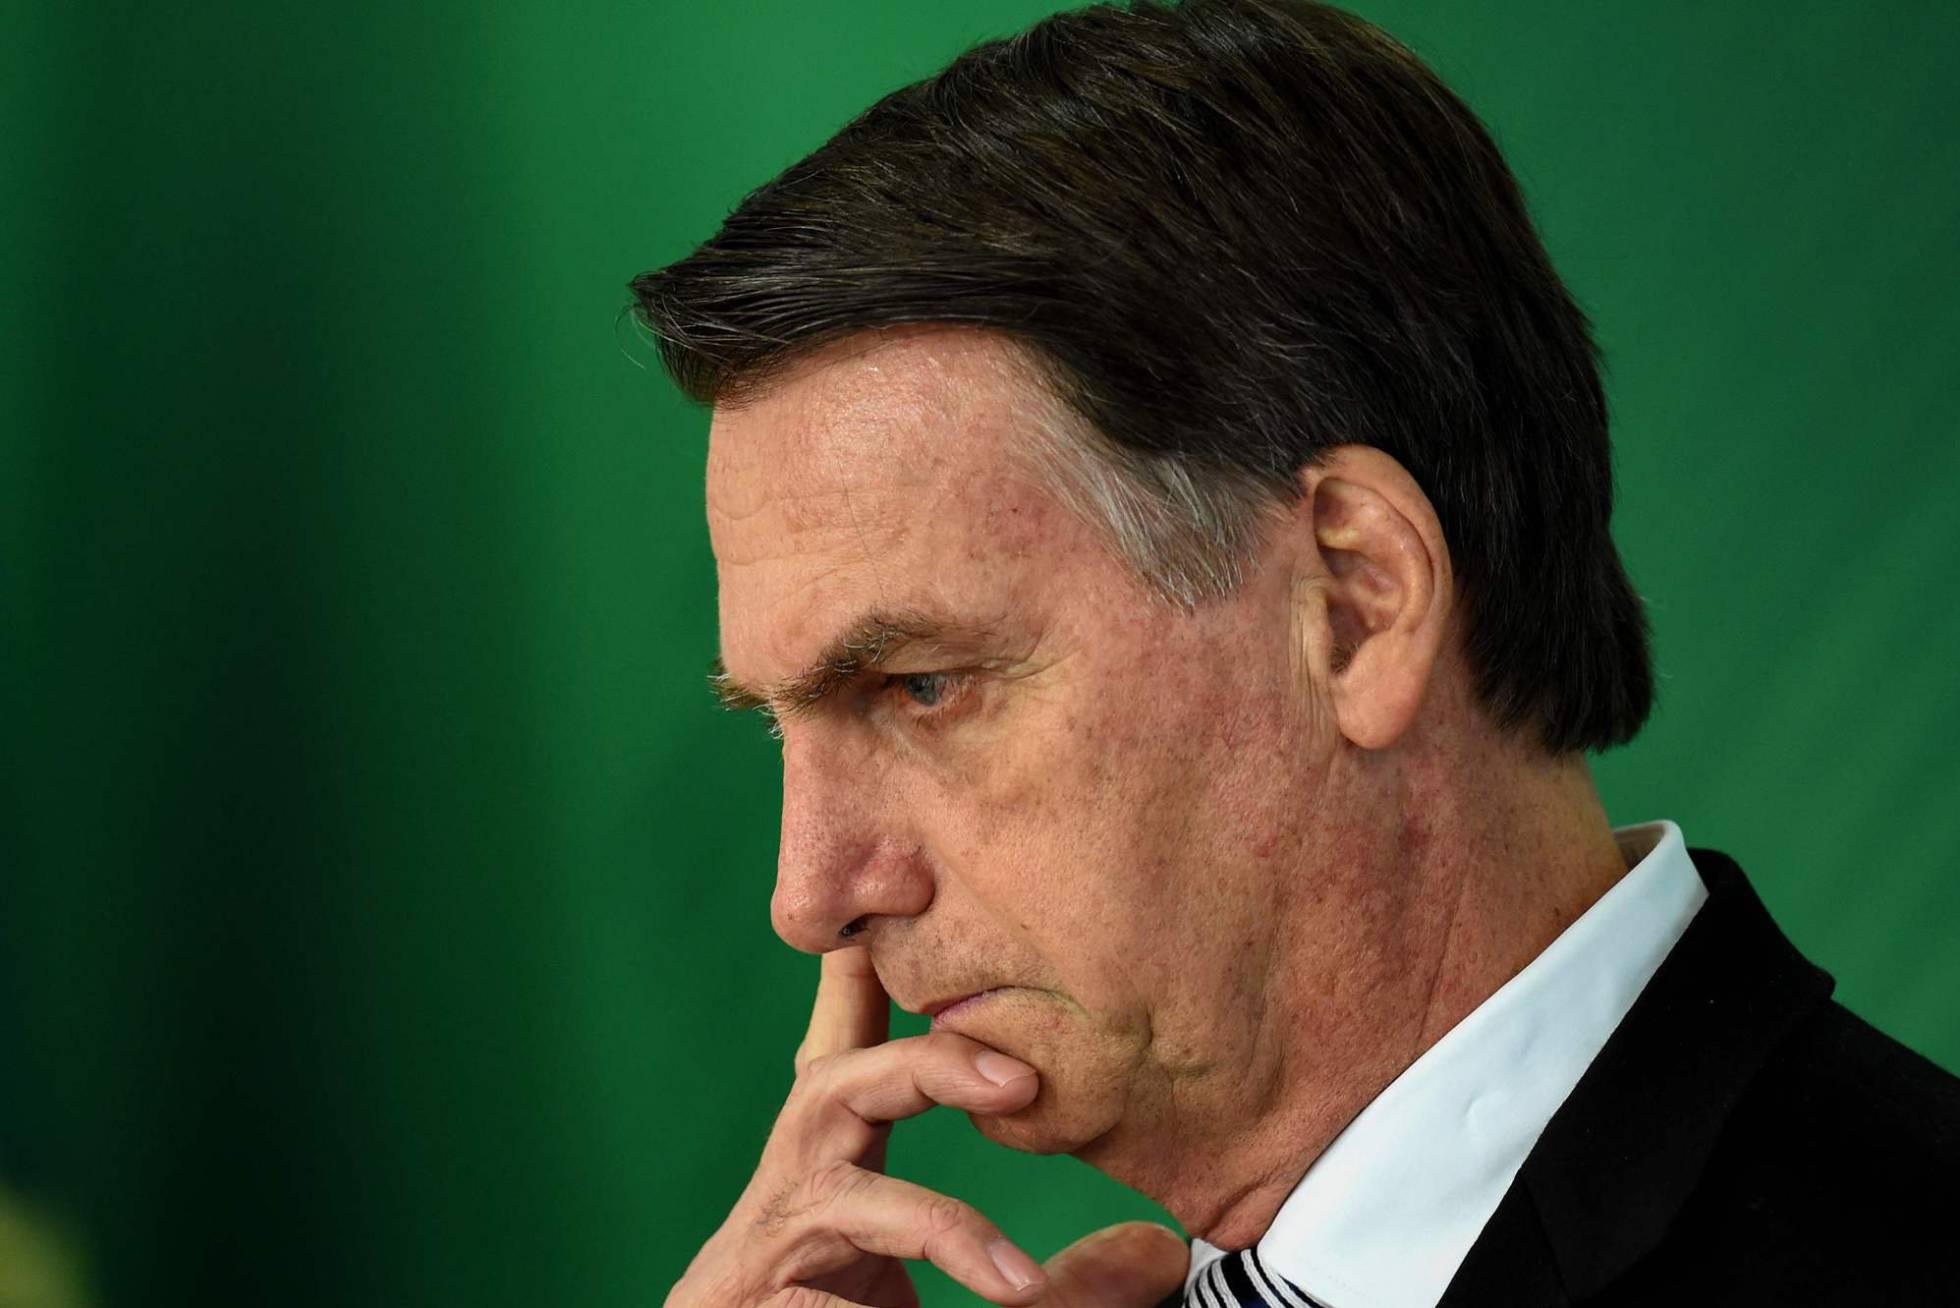 https://ep01.epimg.net/brasil/imagenes/2018/11/08/economia/1541709165_912802_1541709414_noticia_normal_recorte1.jpg